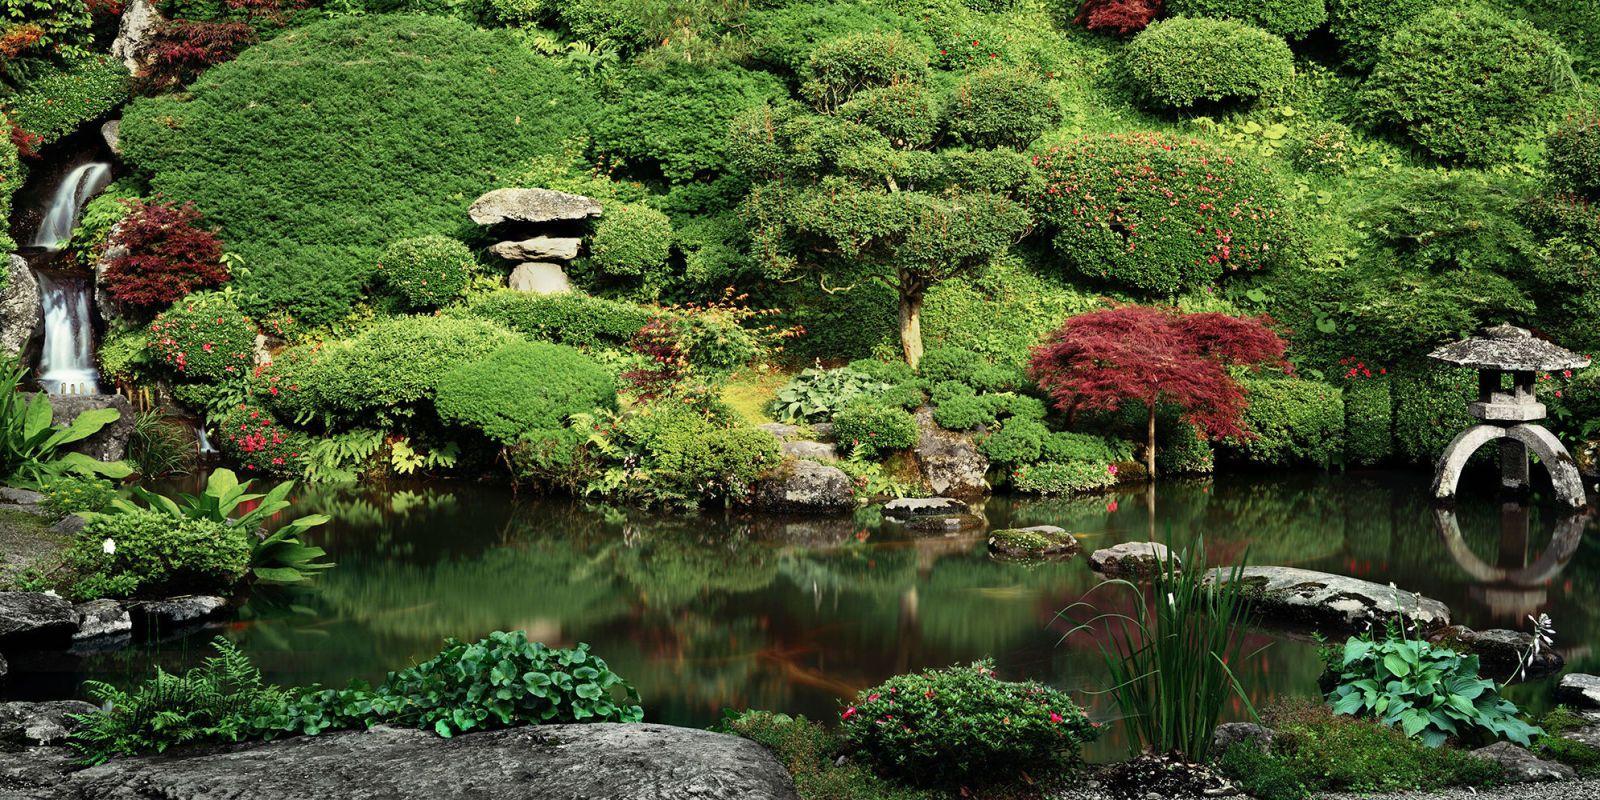 Giardino zen piante giardino zen piante with giardino zen for Giardino zen piante